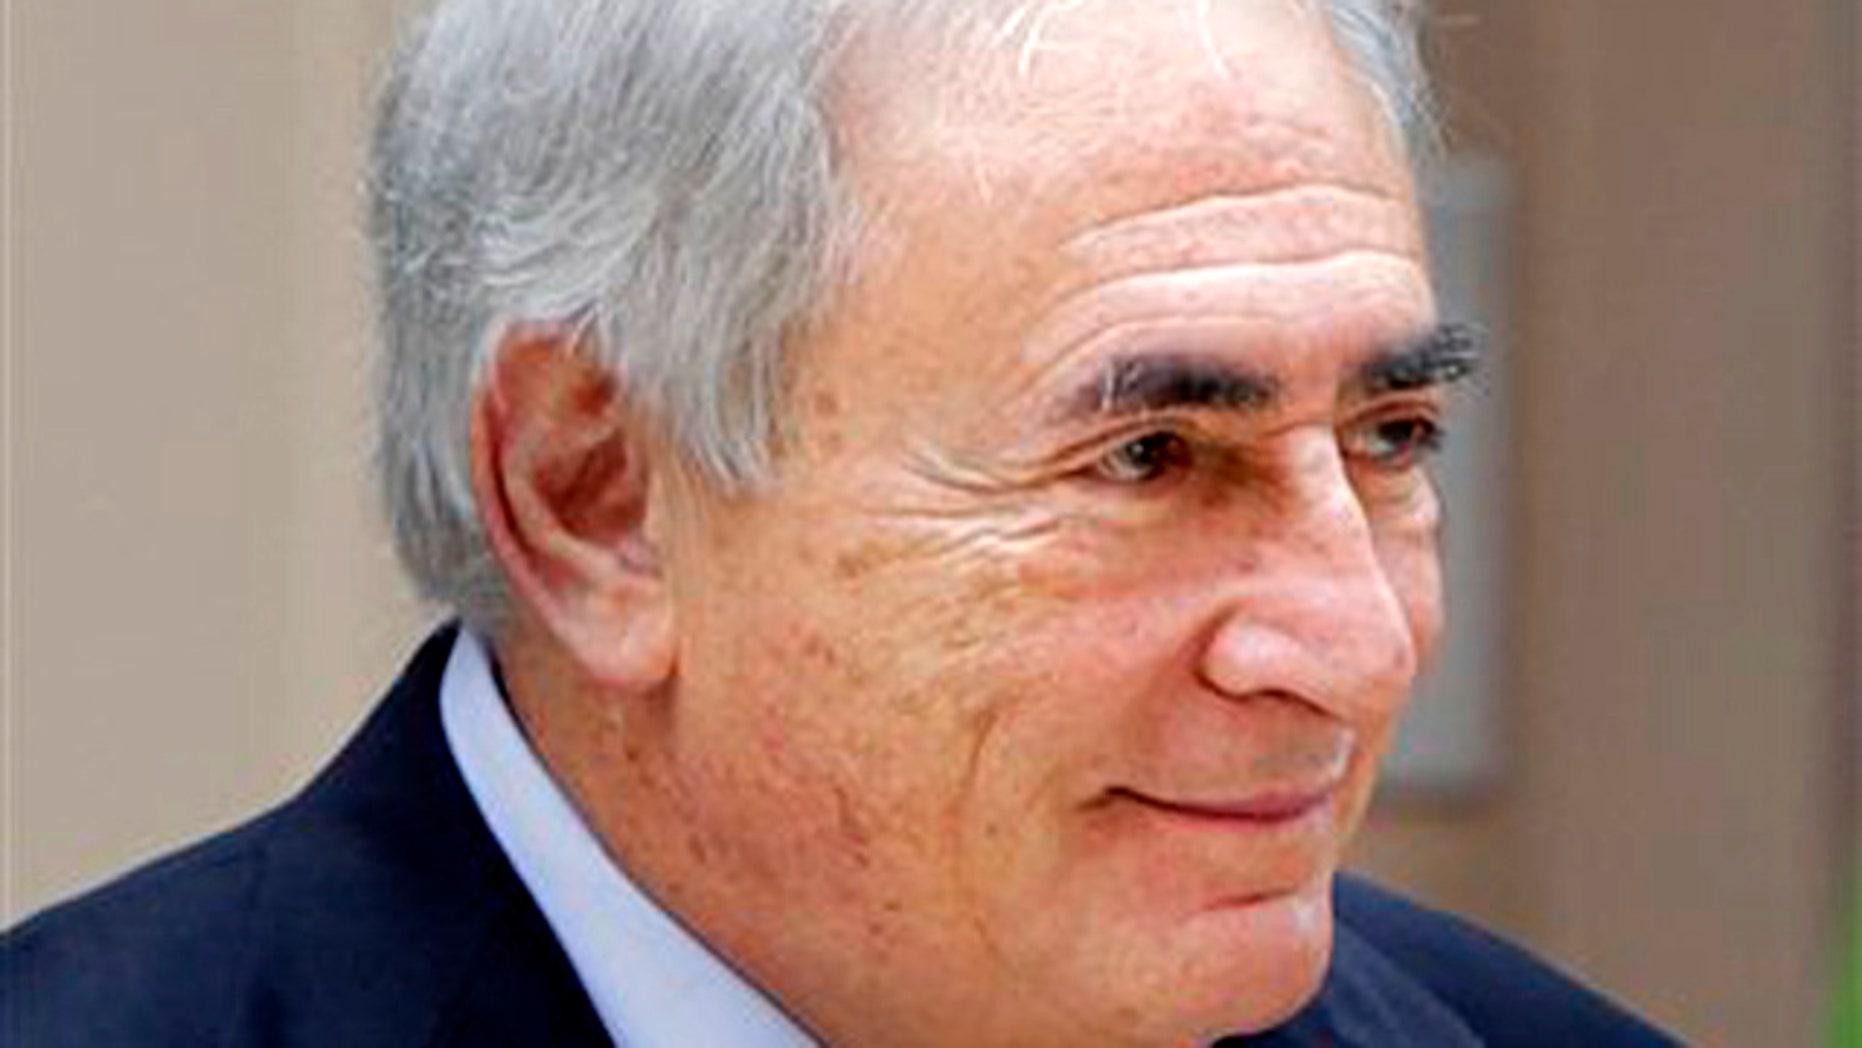 Former IMF head Dominique Strauss-Kahn